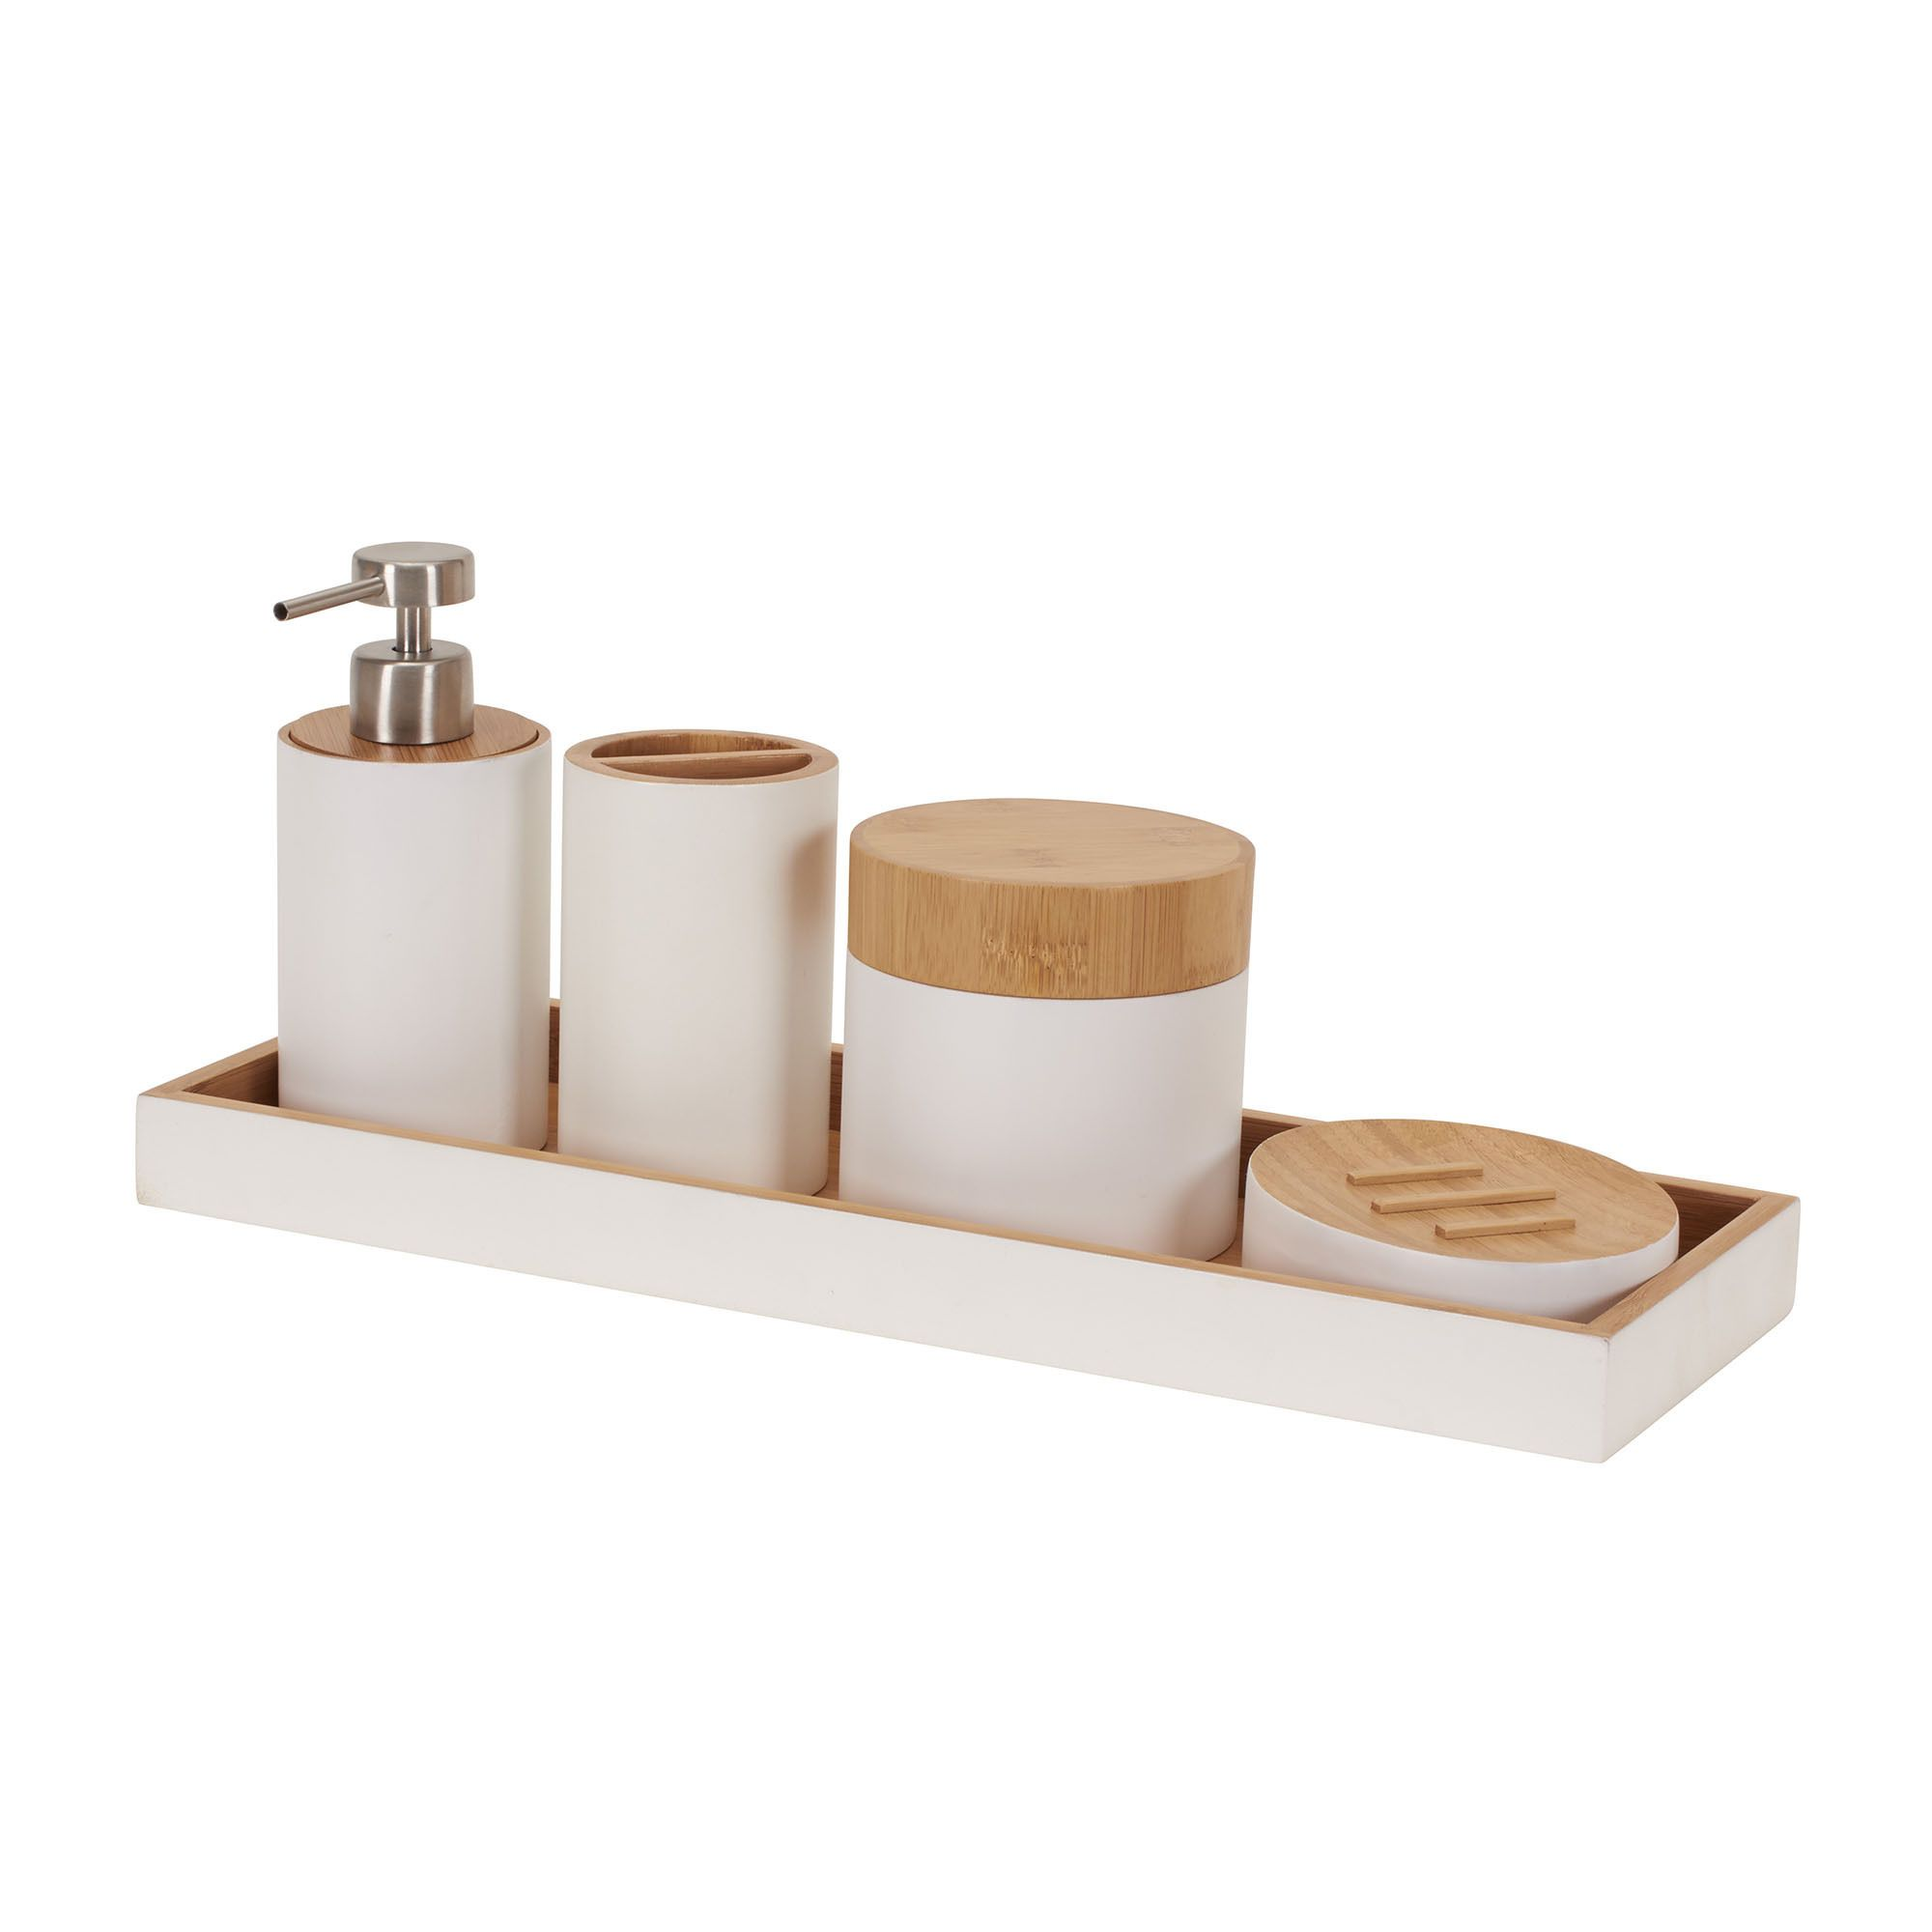 Elements Bamboo 5-Piece Bathroom Vanity Set | Hipster | Pinterest ...